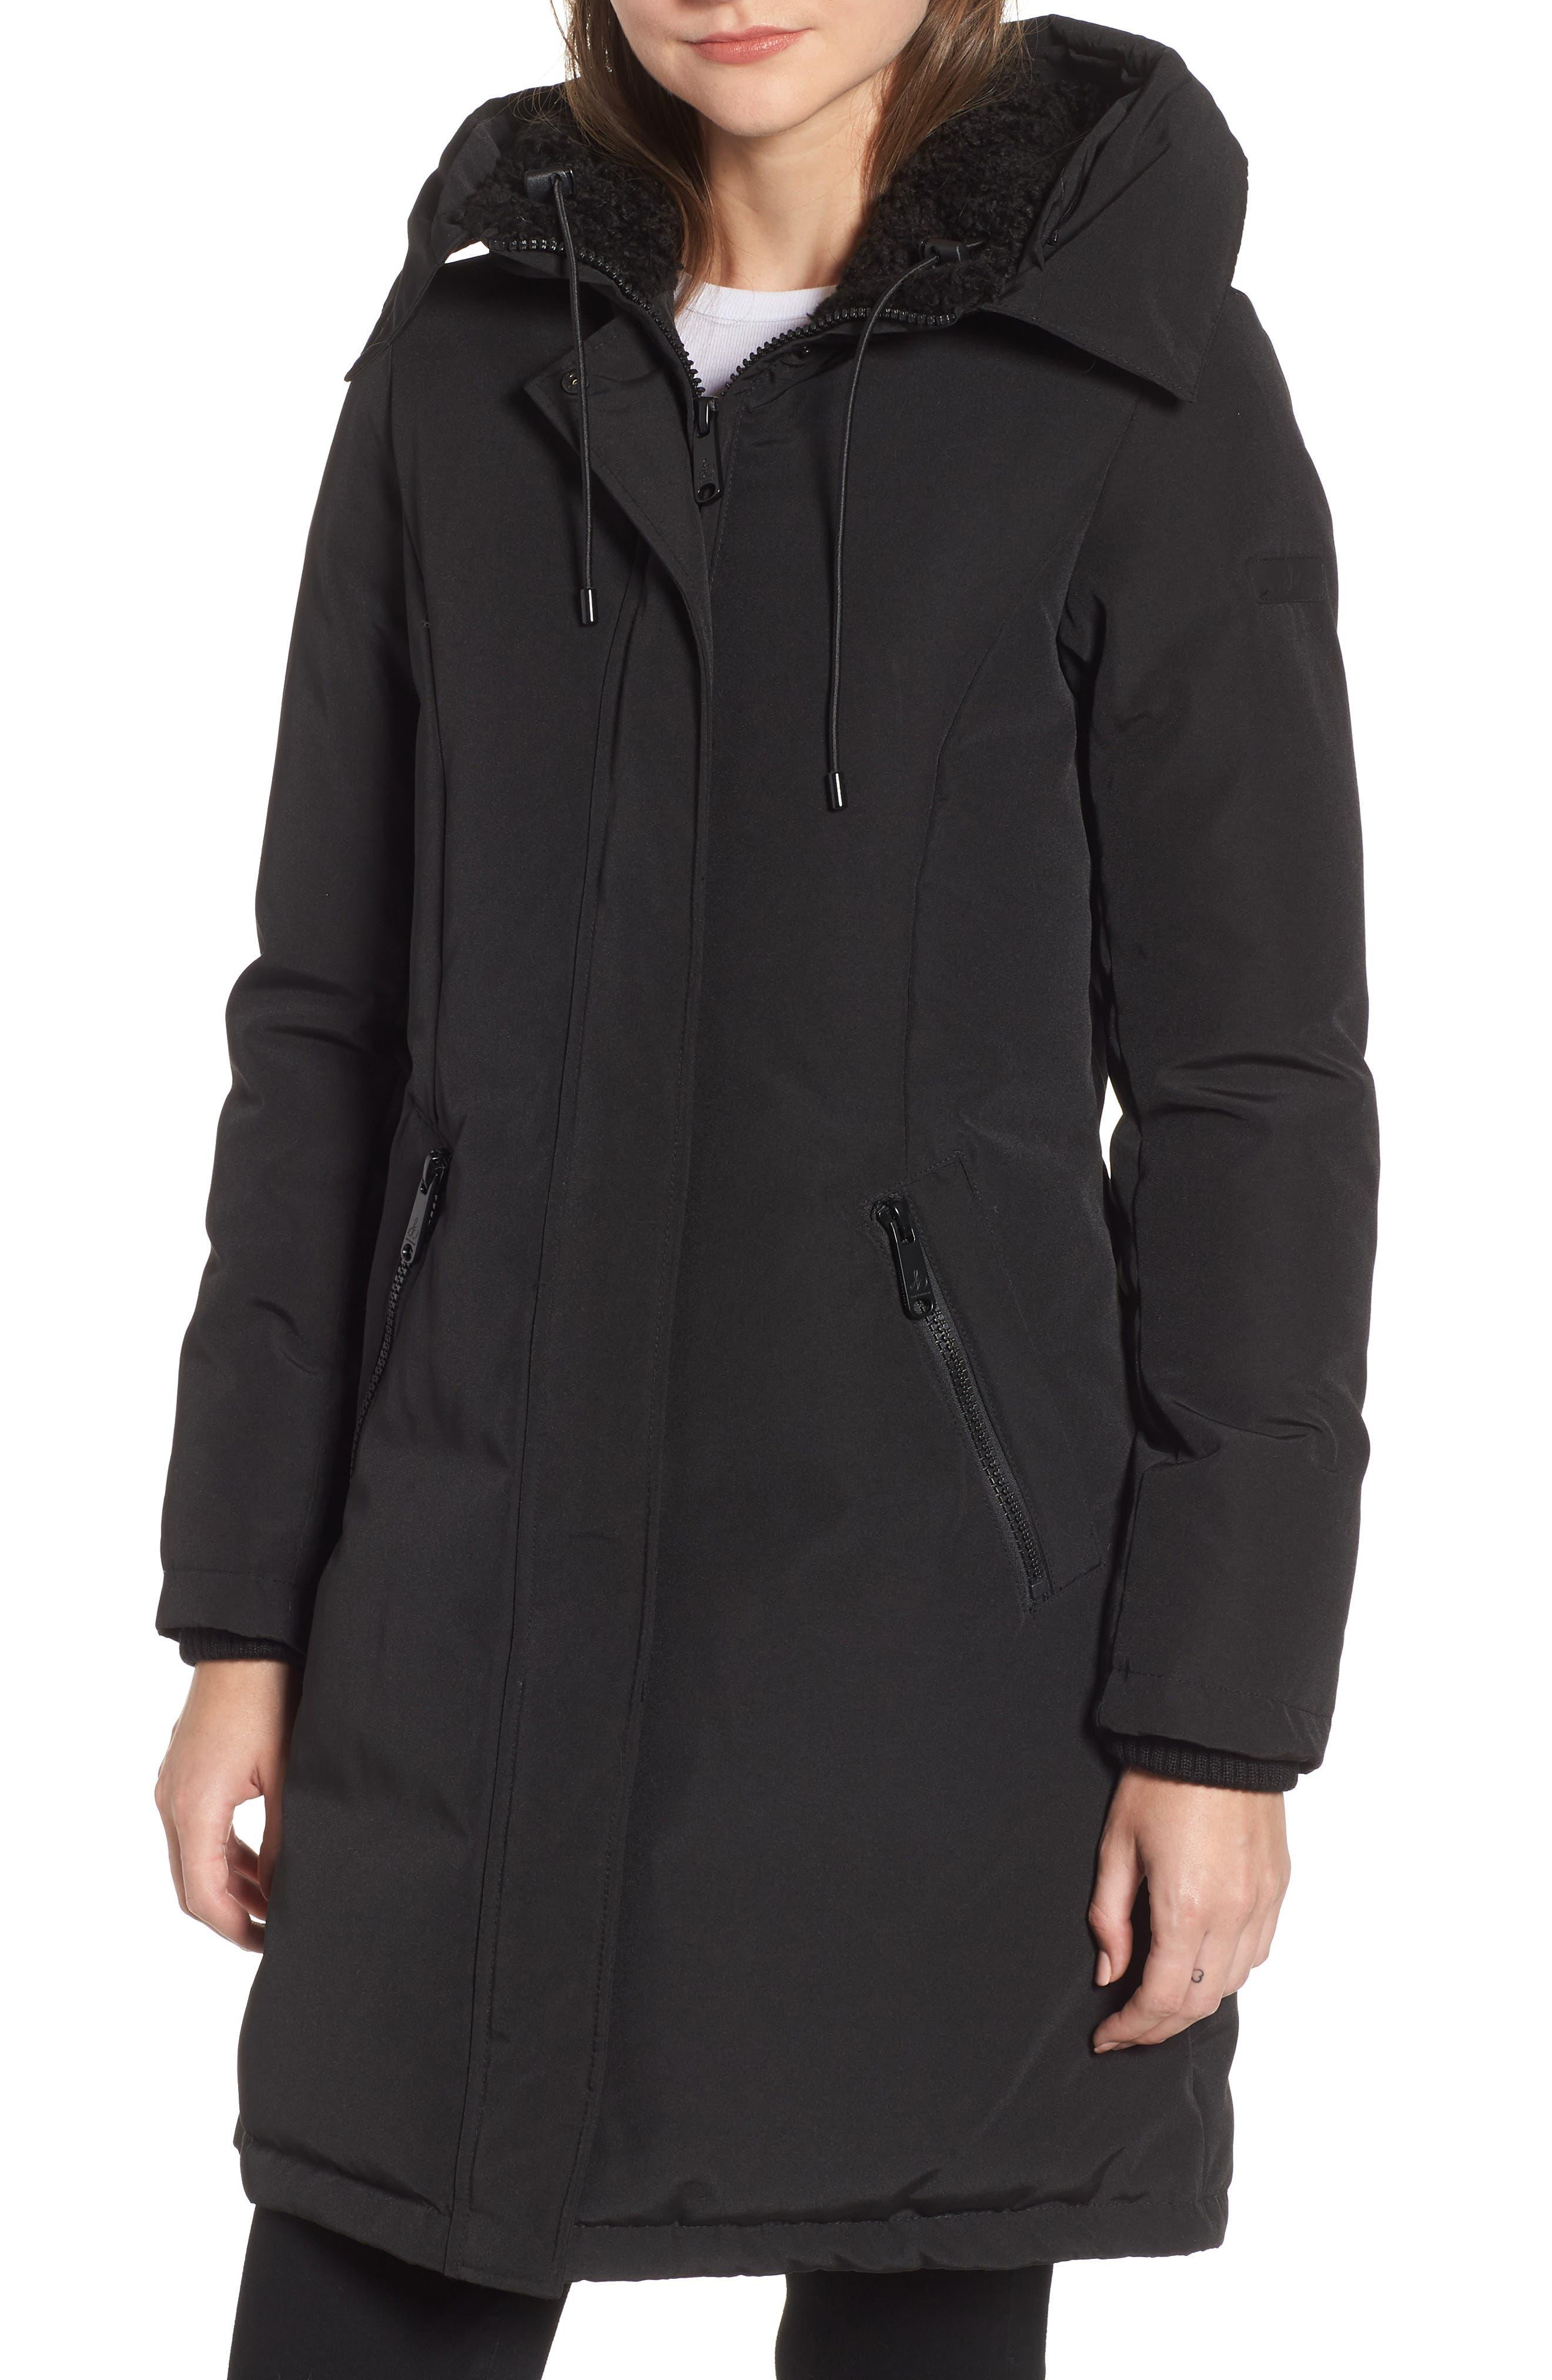 SAM EDELMAN, Faux Fur Trim Down Jacket, Alternate thumbnail 5, color, 001